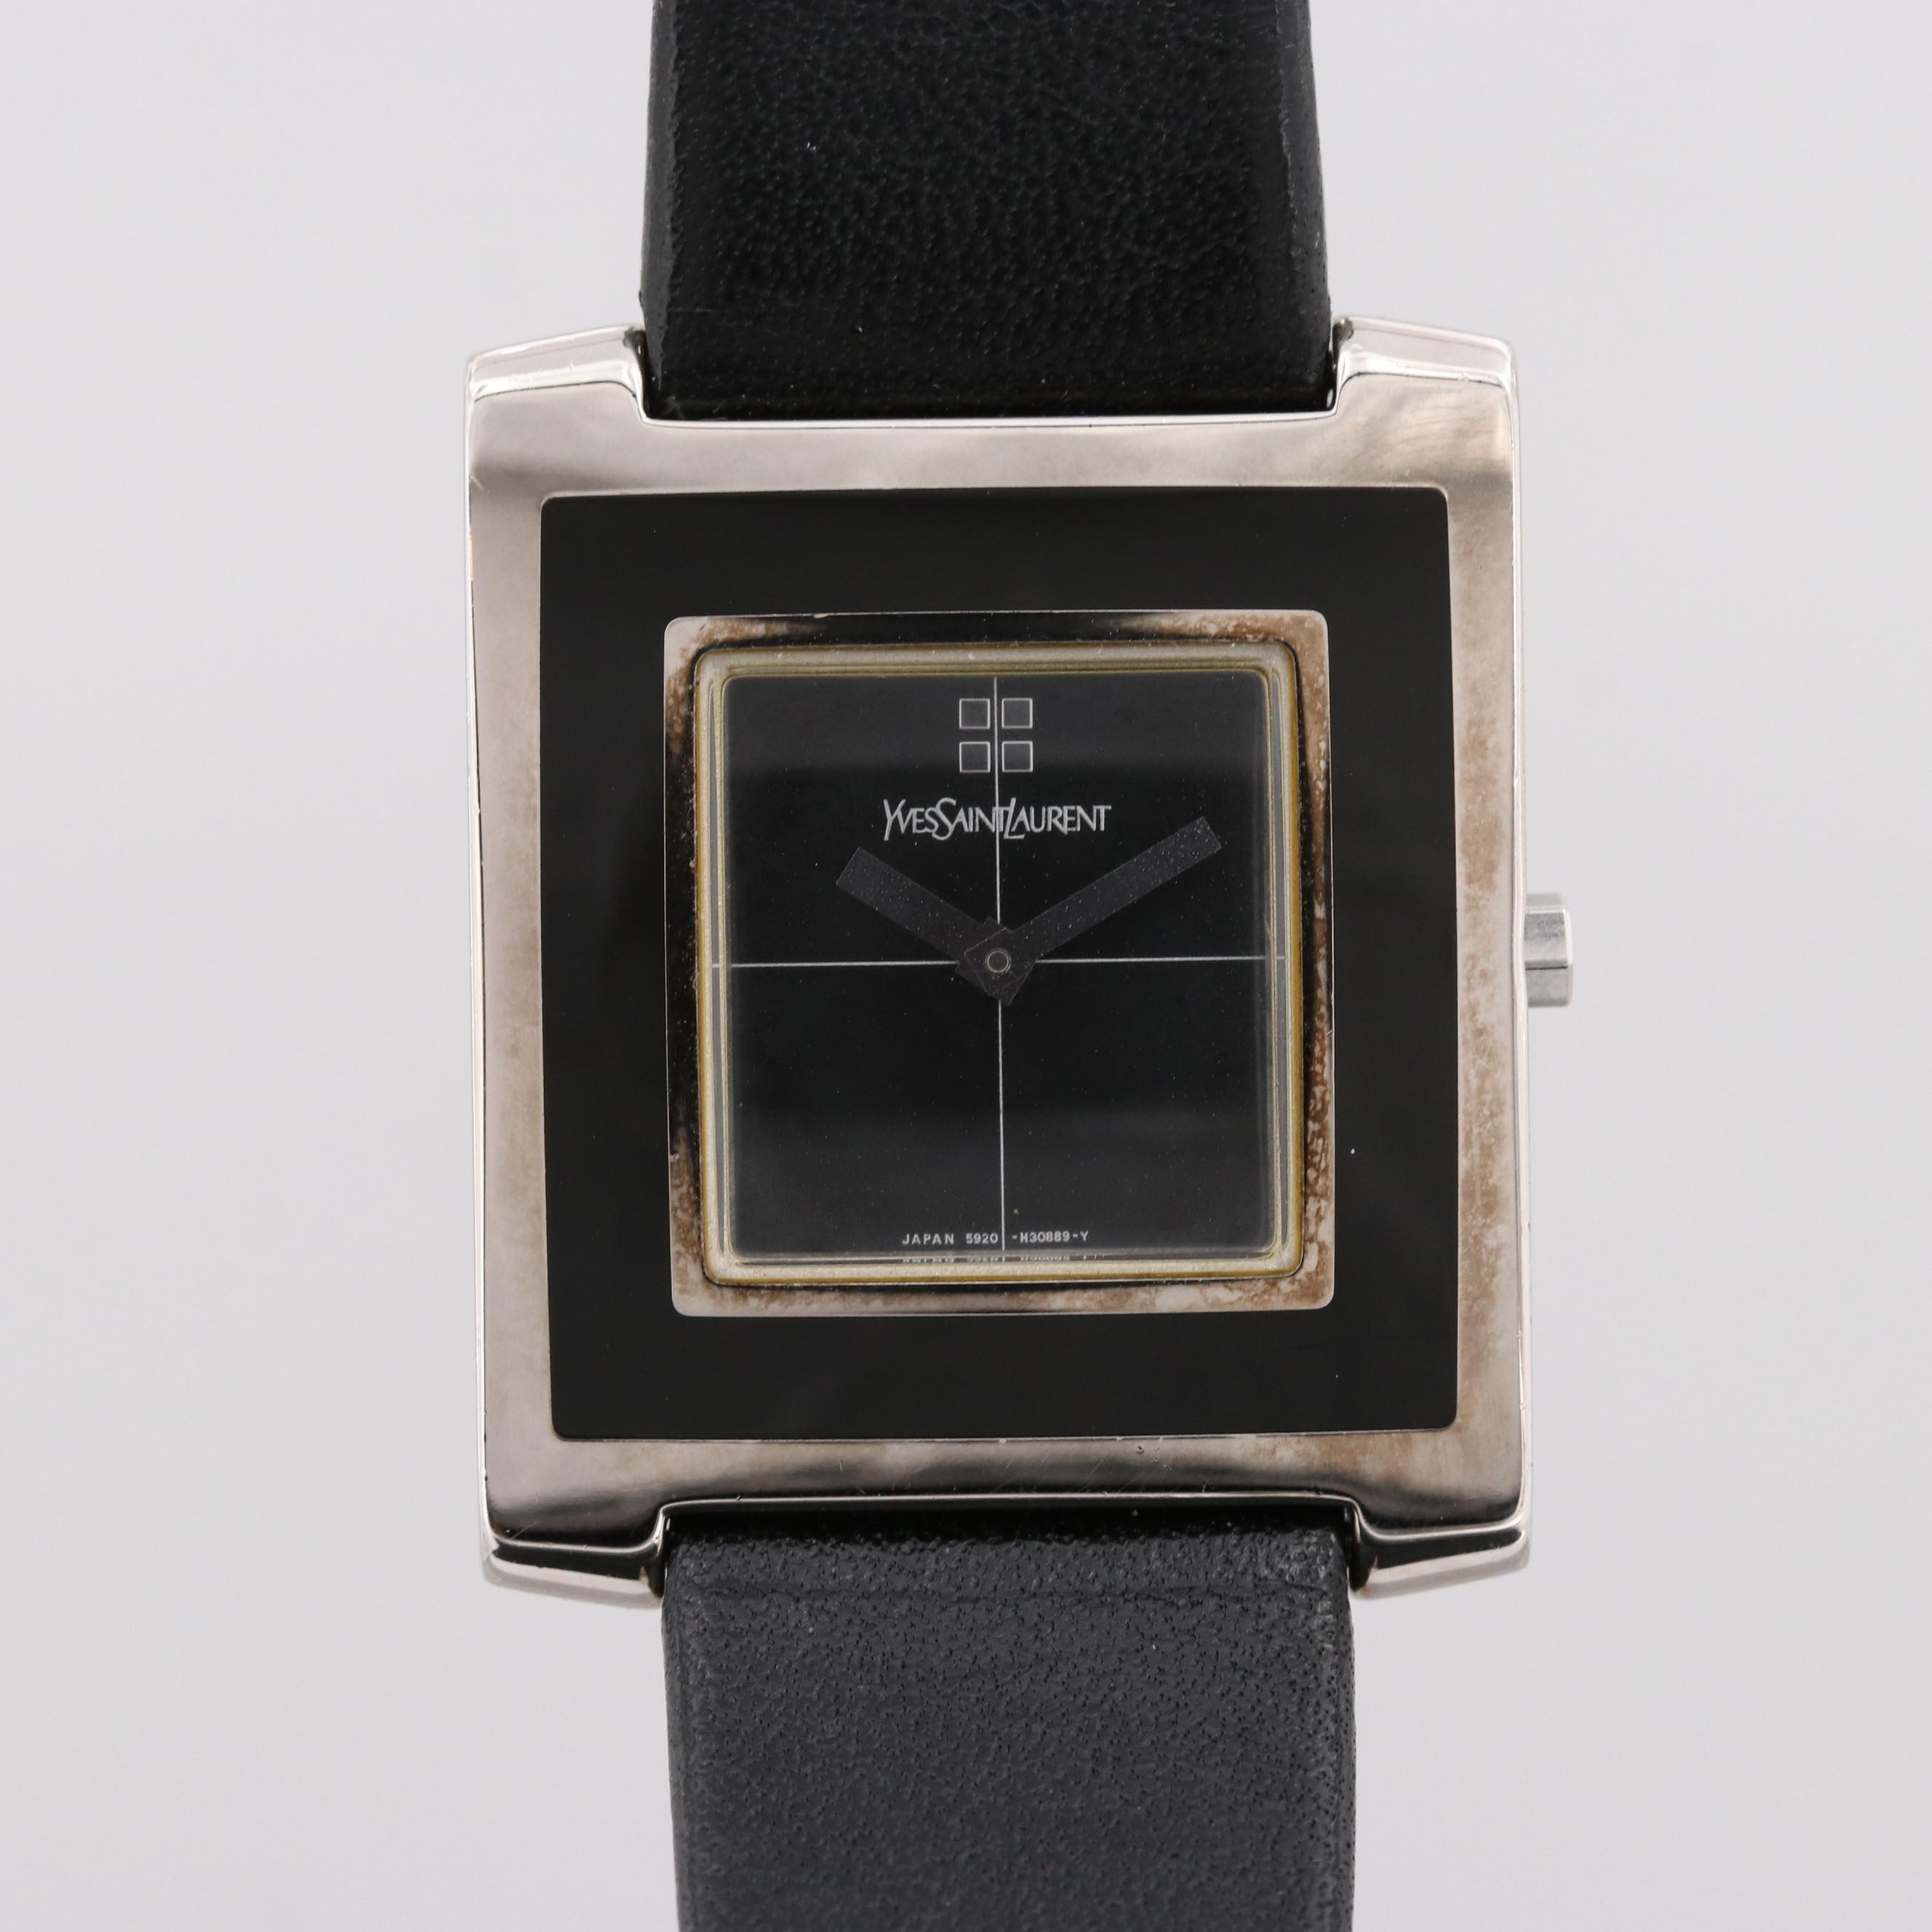 Yves Saint Laurent Black Enamel Wristwatch